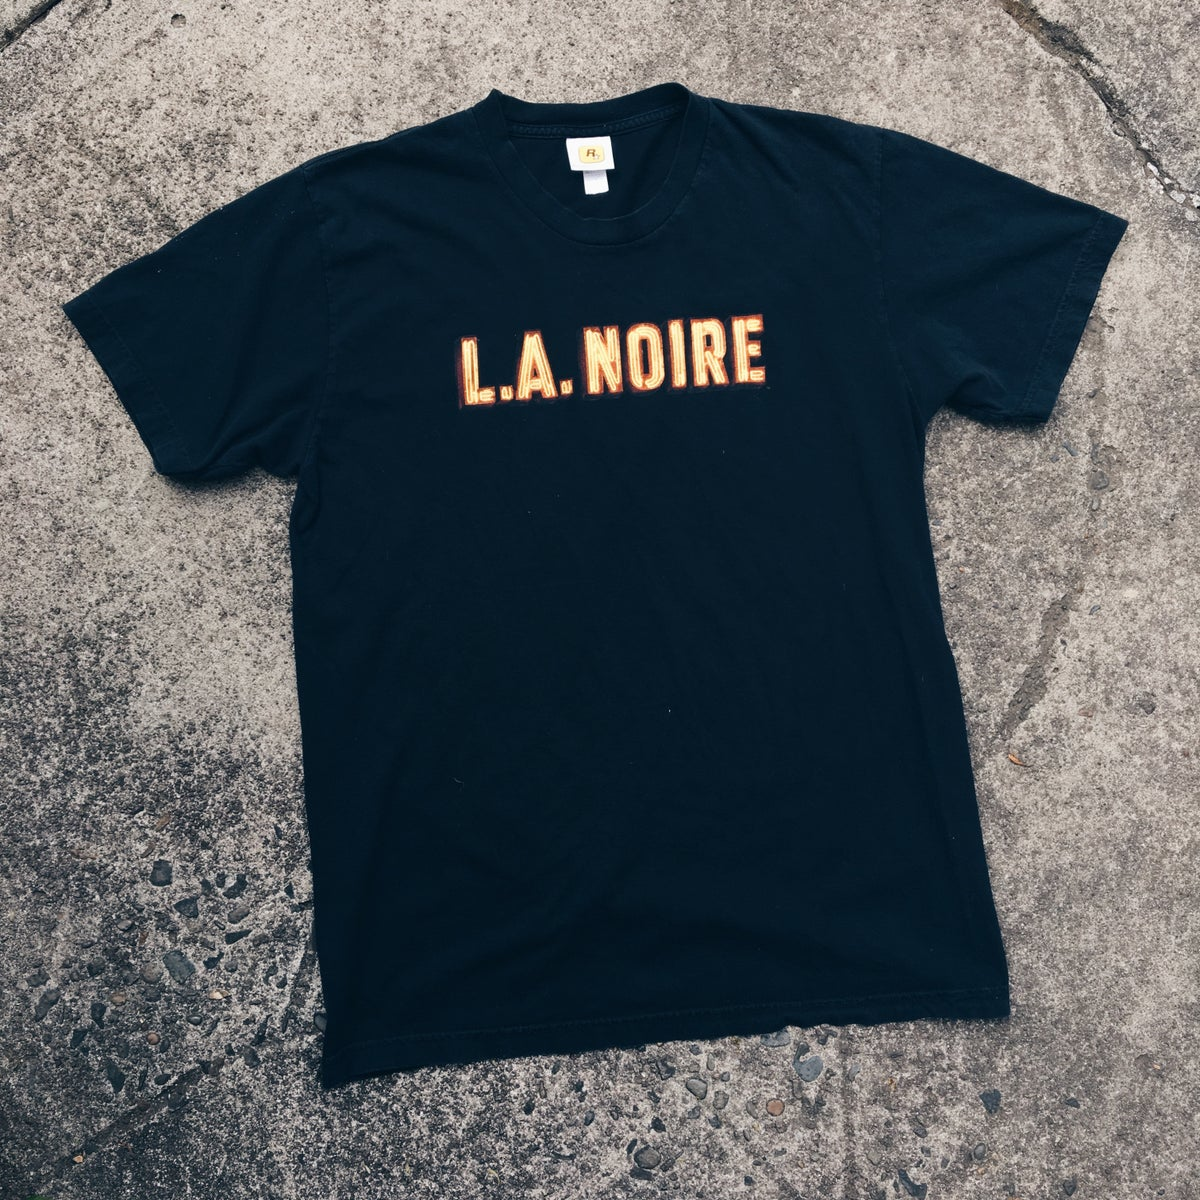 Image of Original 2011 Rockstar Games L.A. Noire Promo Tee.